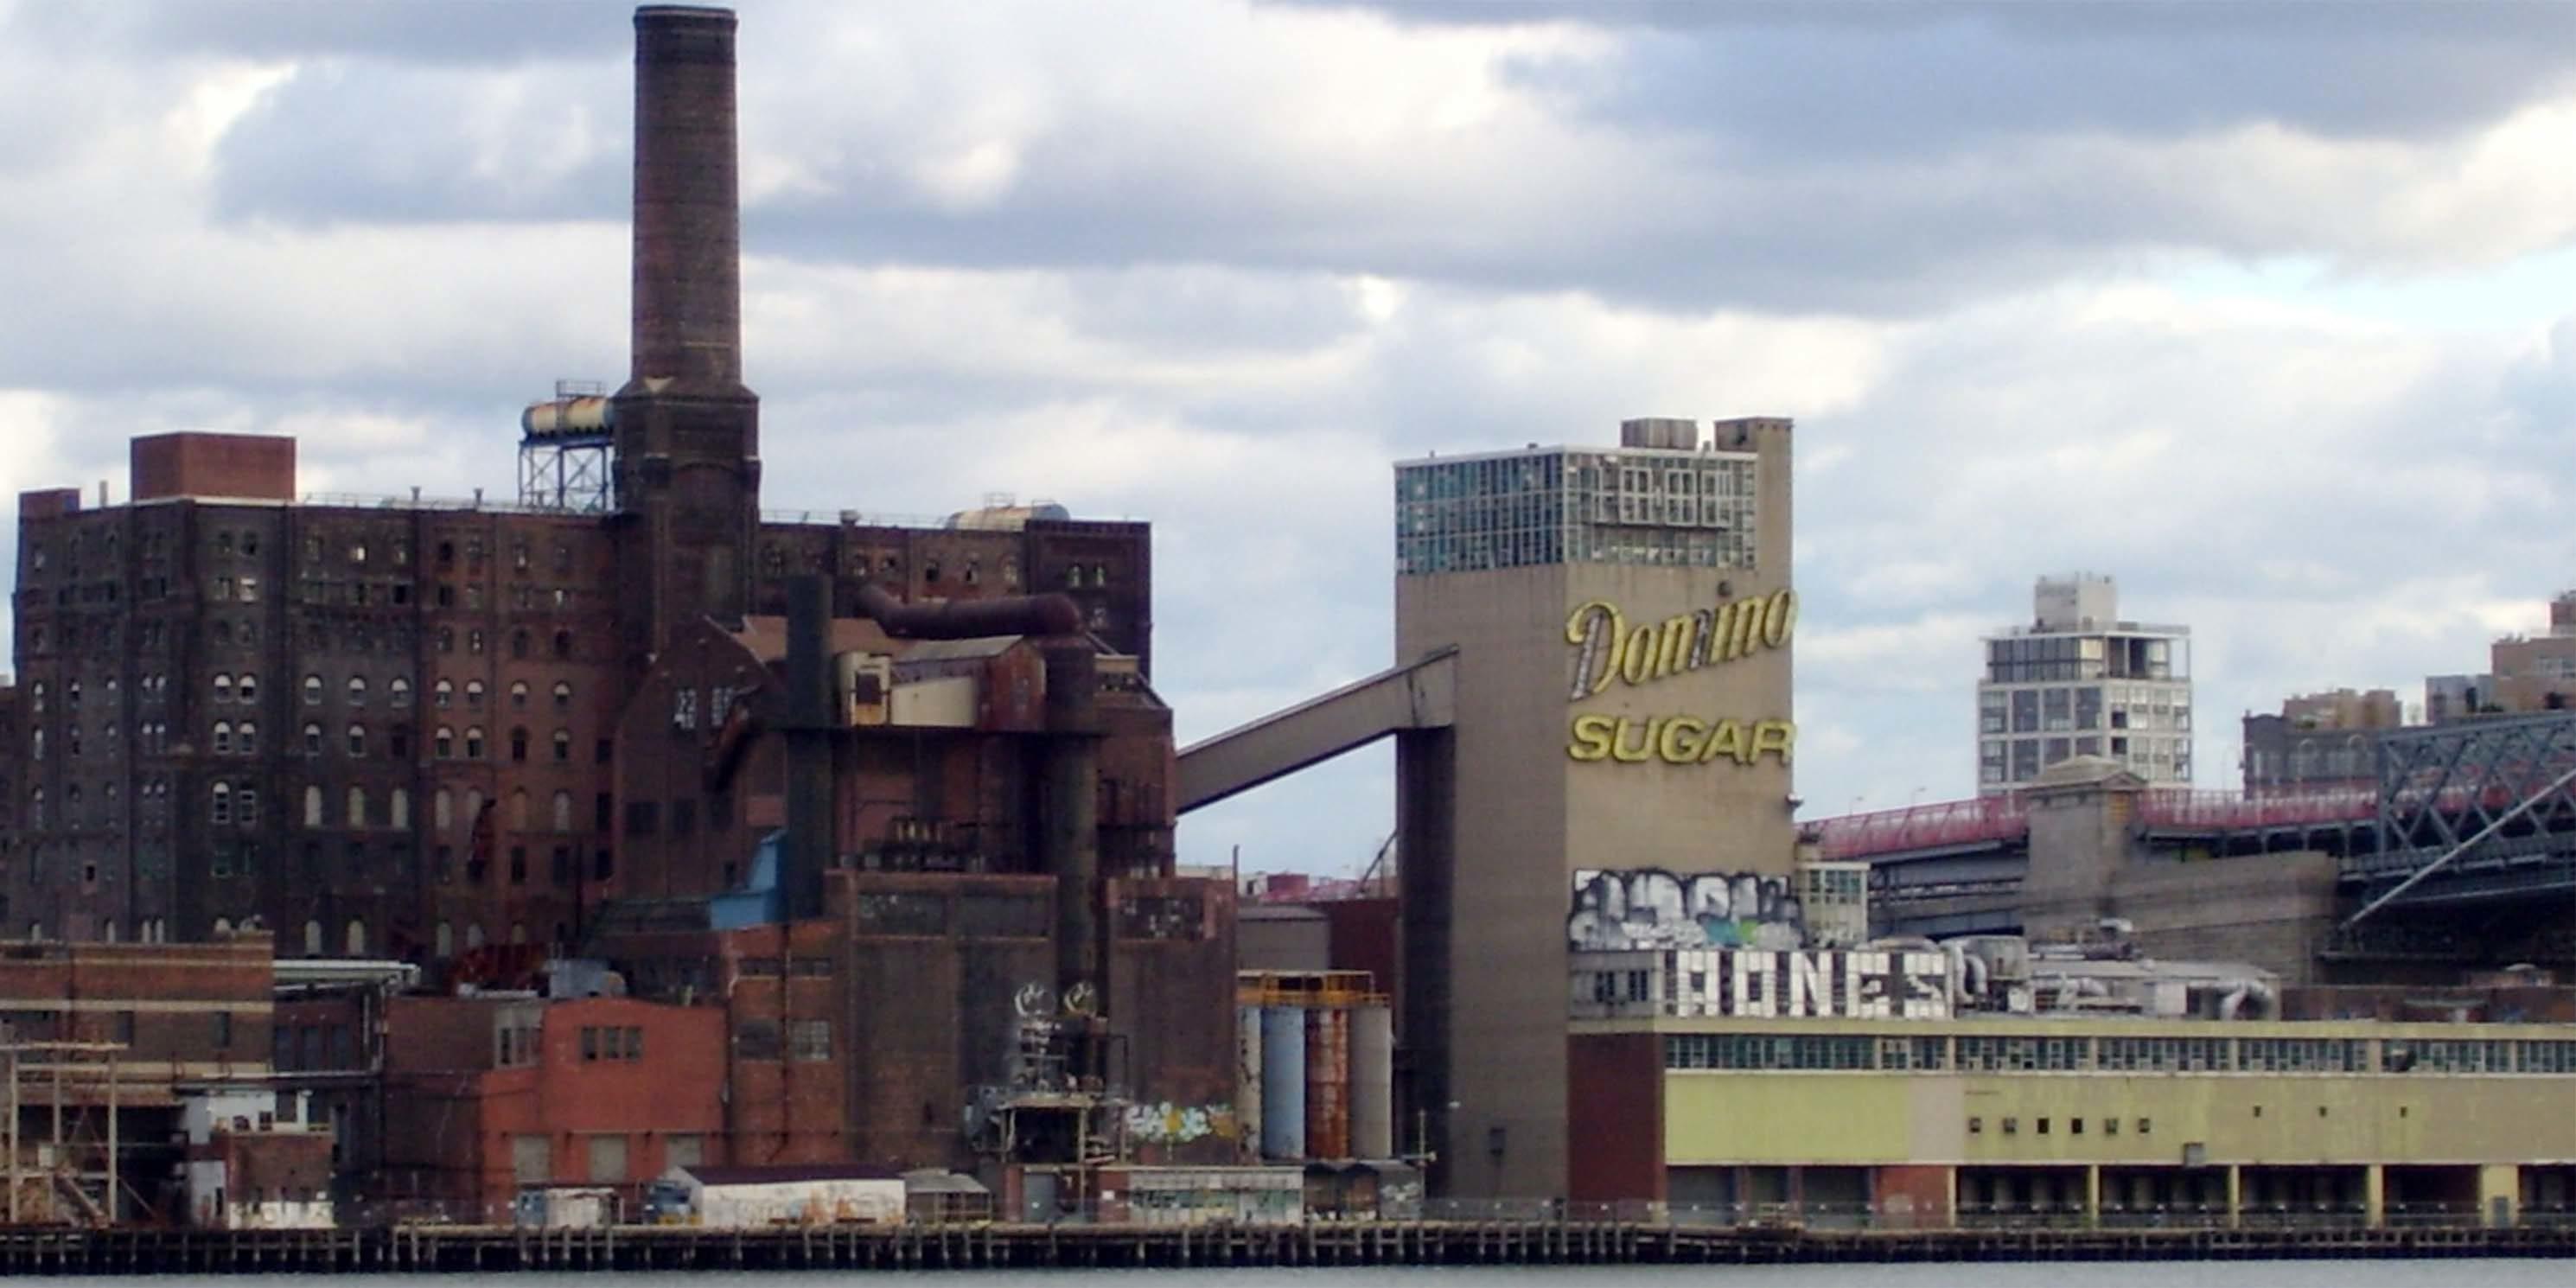 exterior of the Domino Sugar refinery